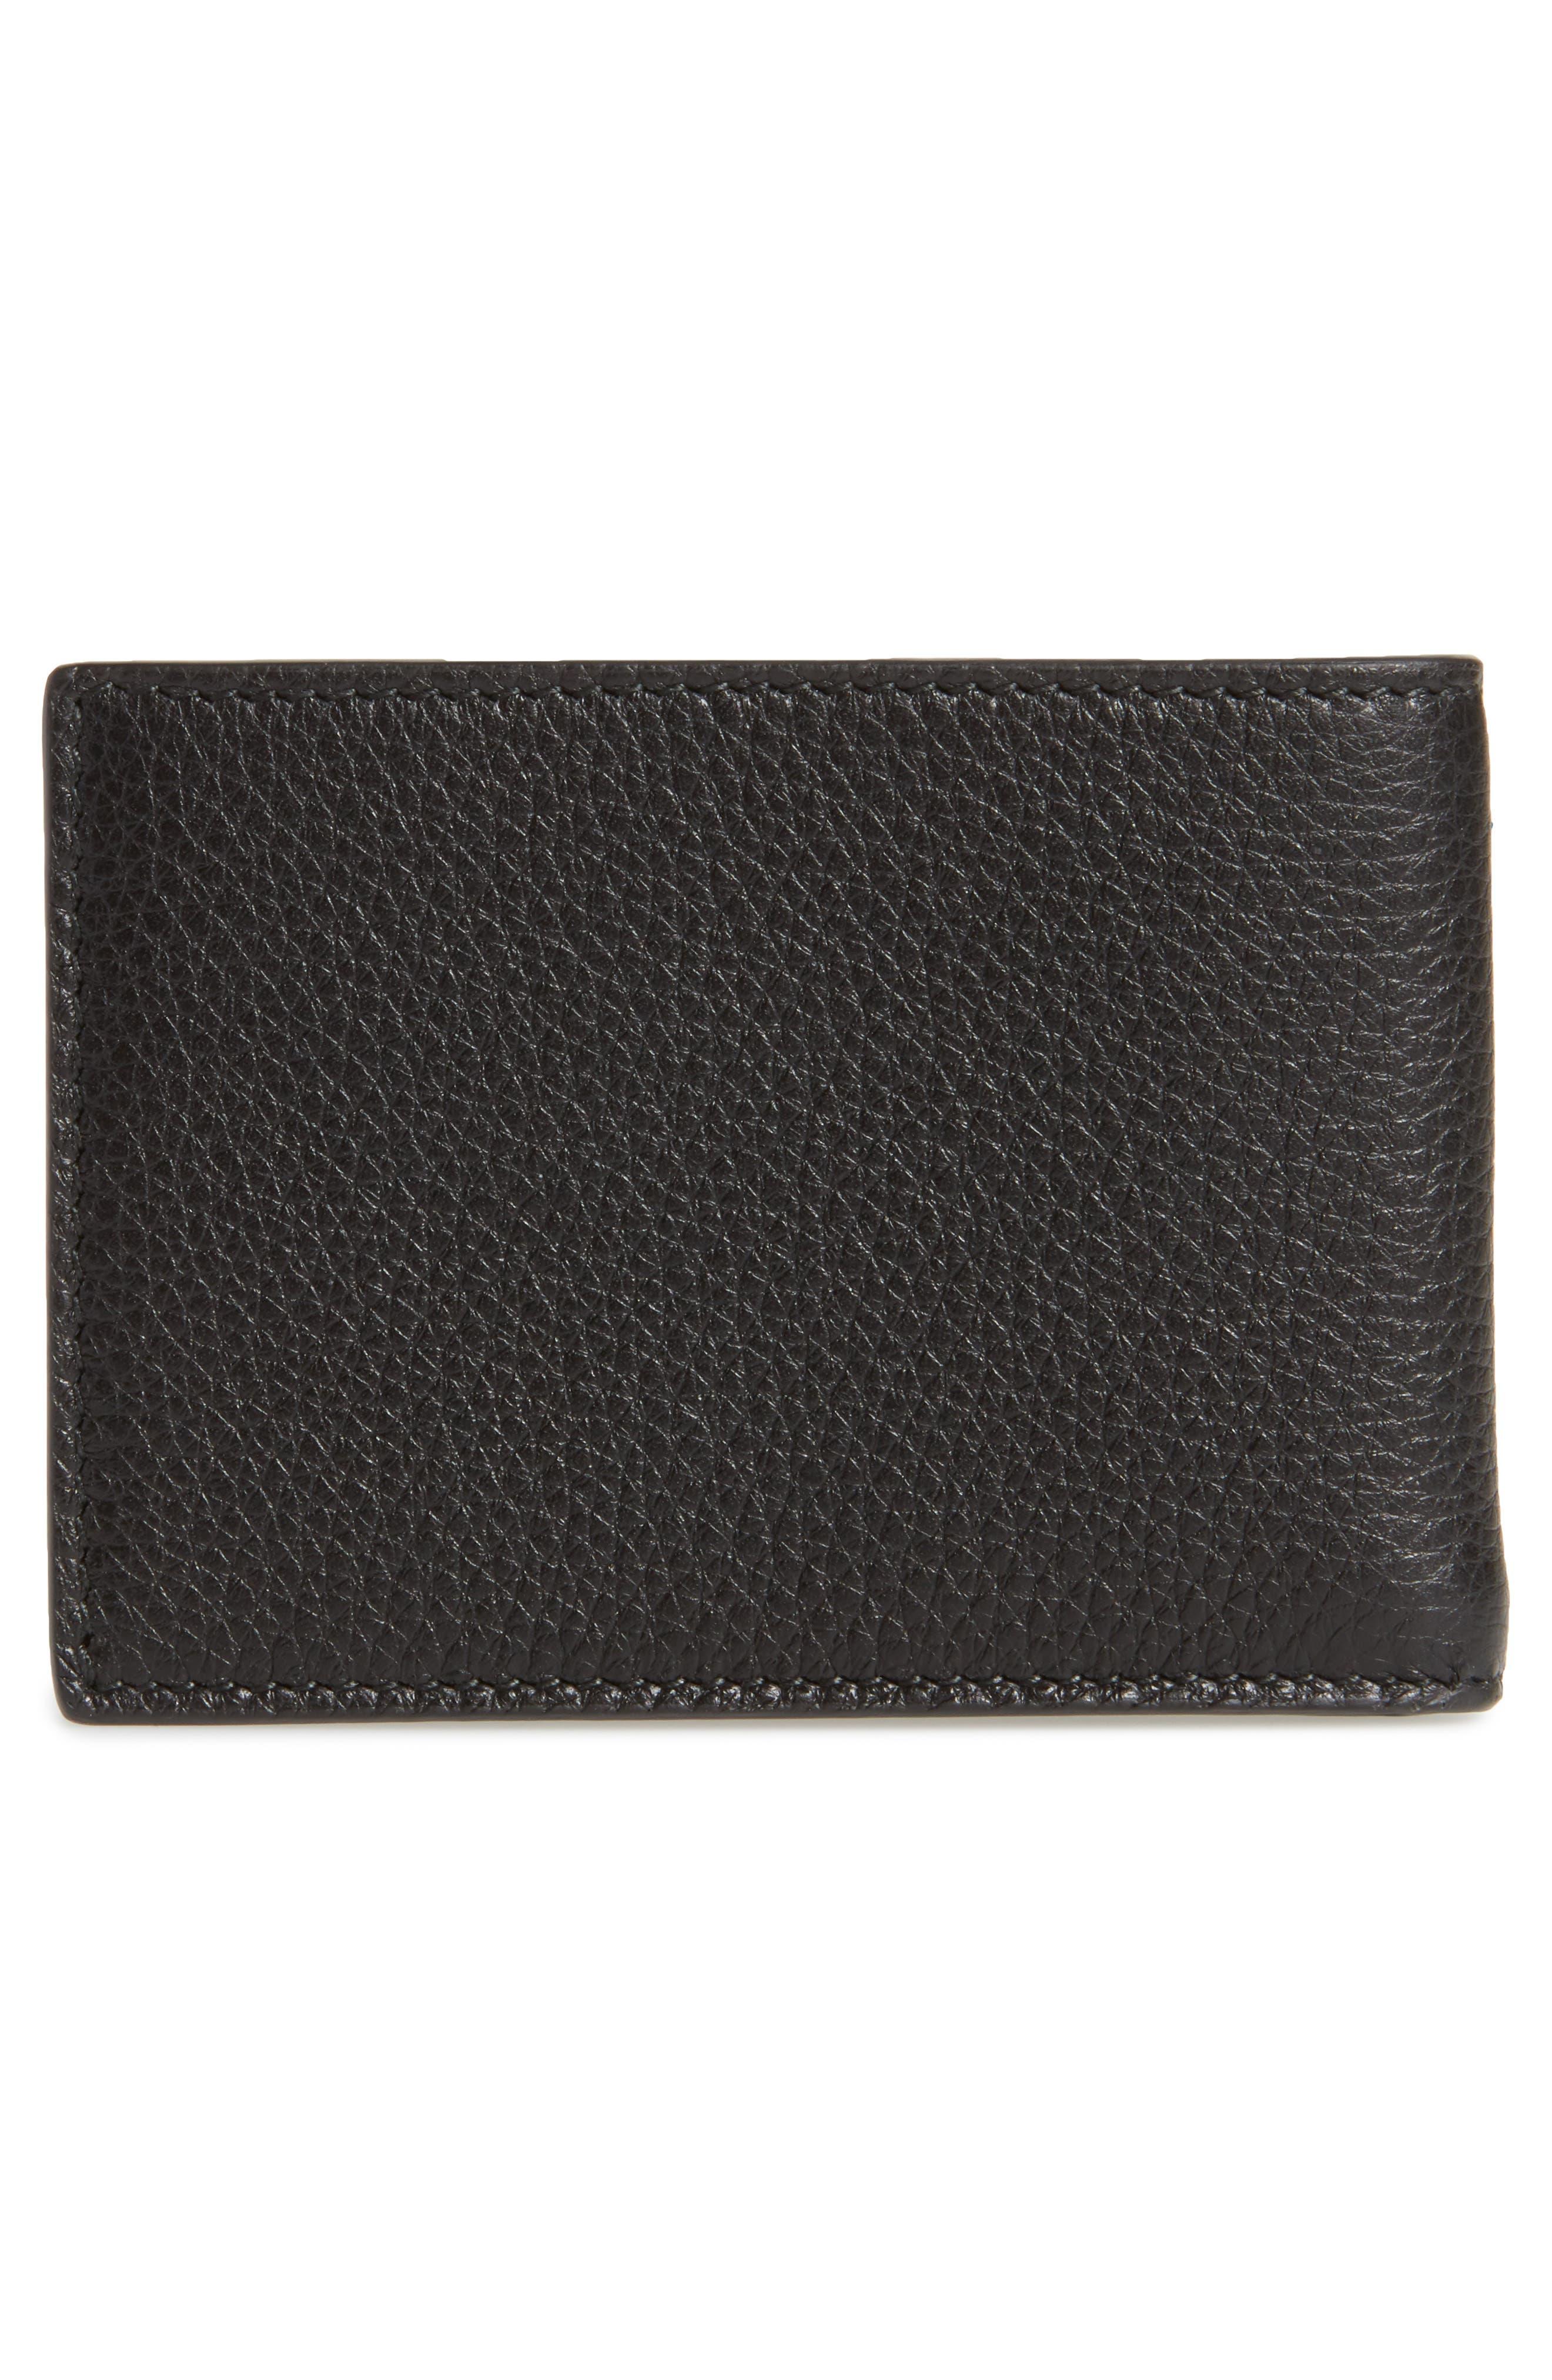 Bifold Wallet,                             Alternate thumbnail 3, color,                             Black